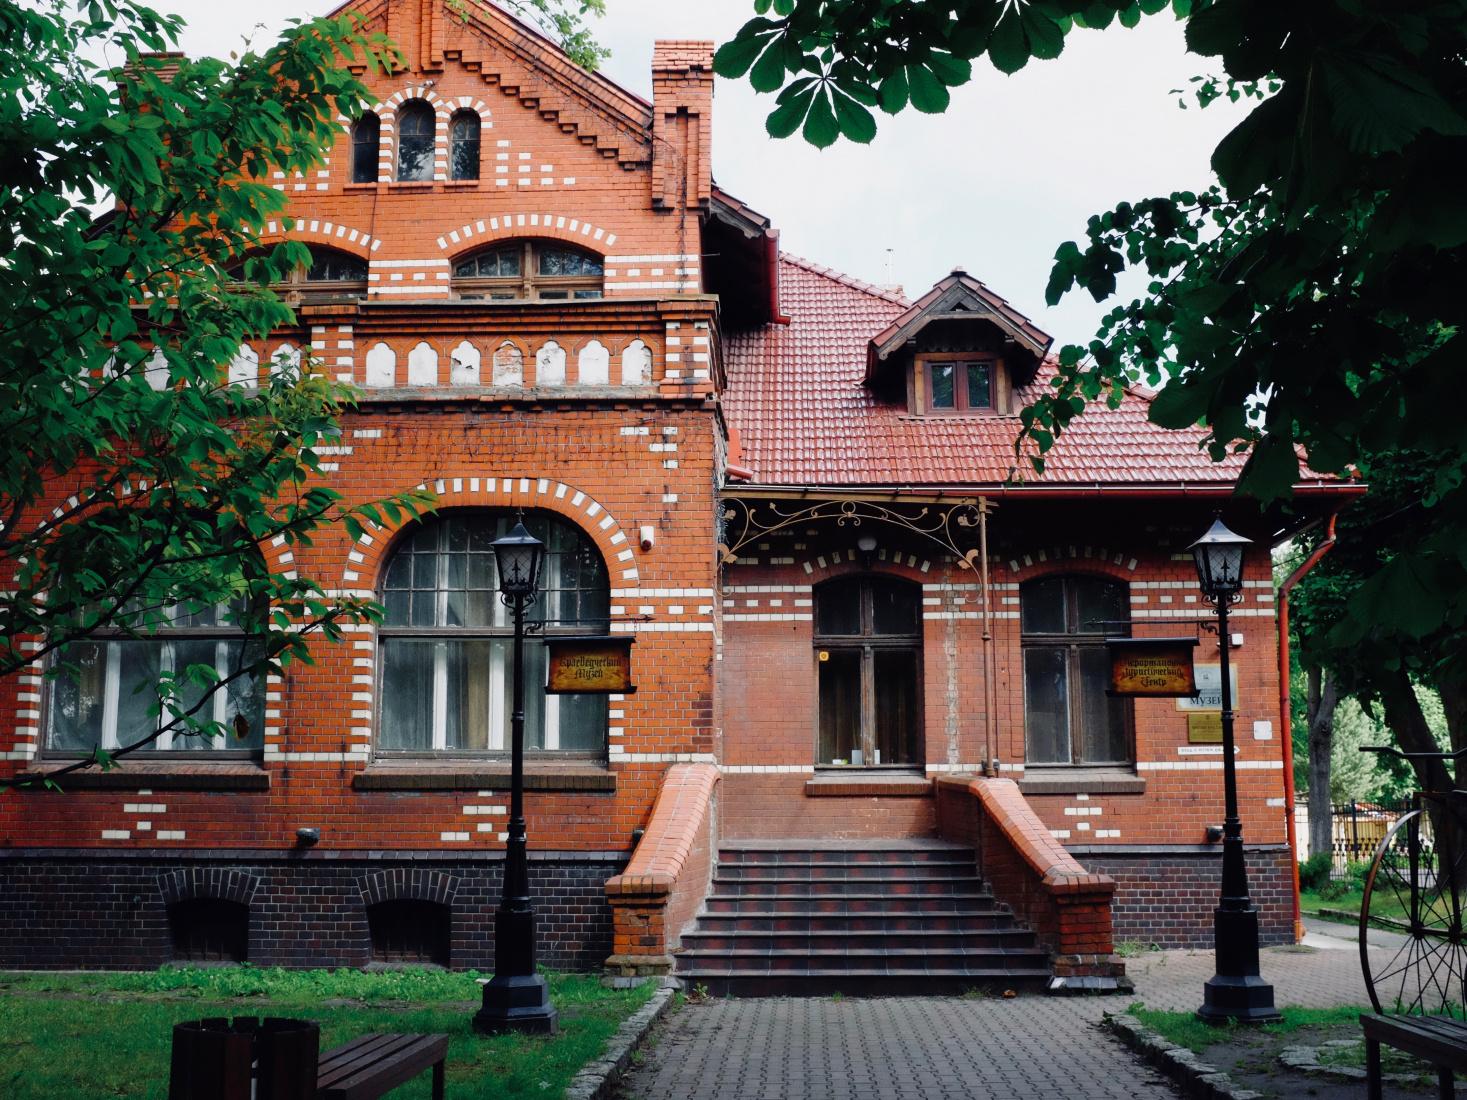 Surviving old red brick Prussian buildings in Zelenogradsk, outside Kaliningrad, Russia.